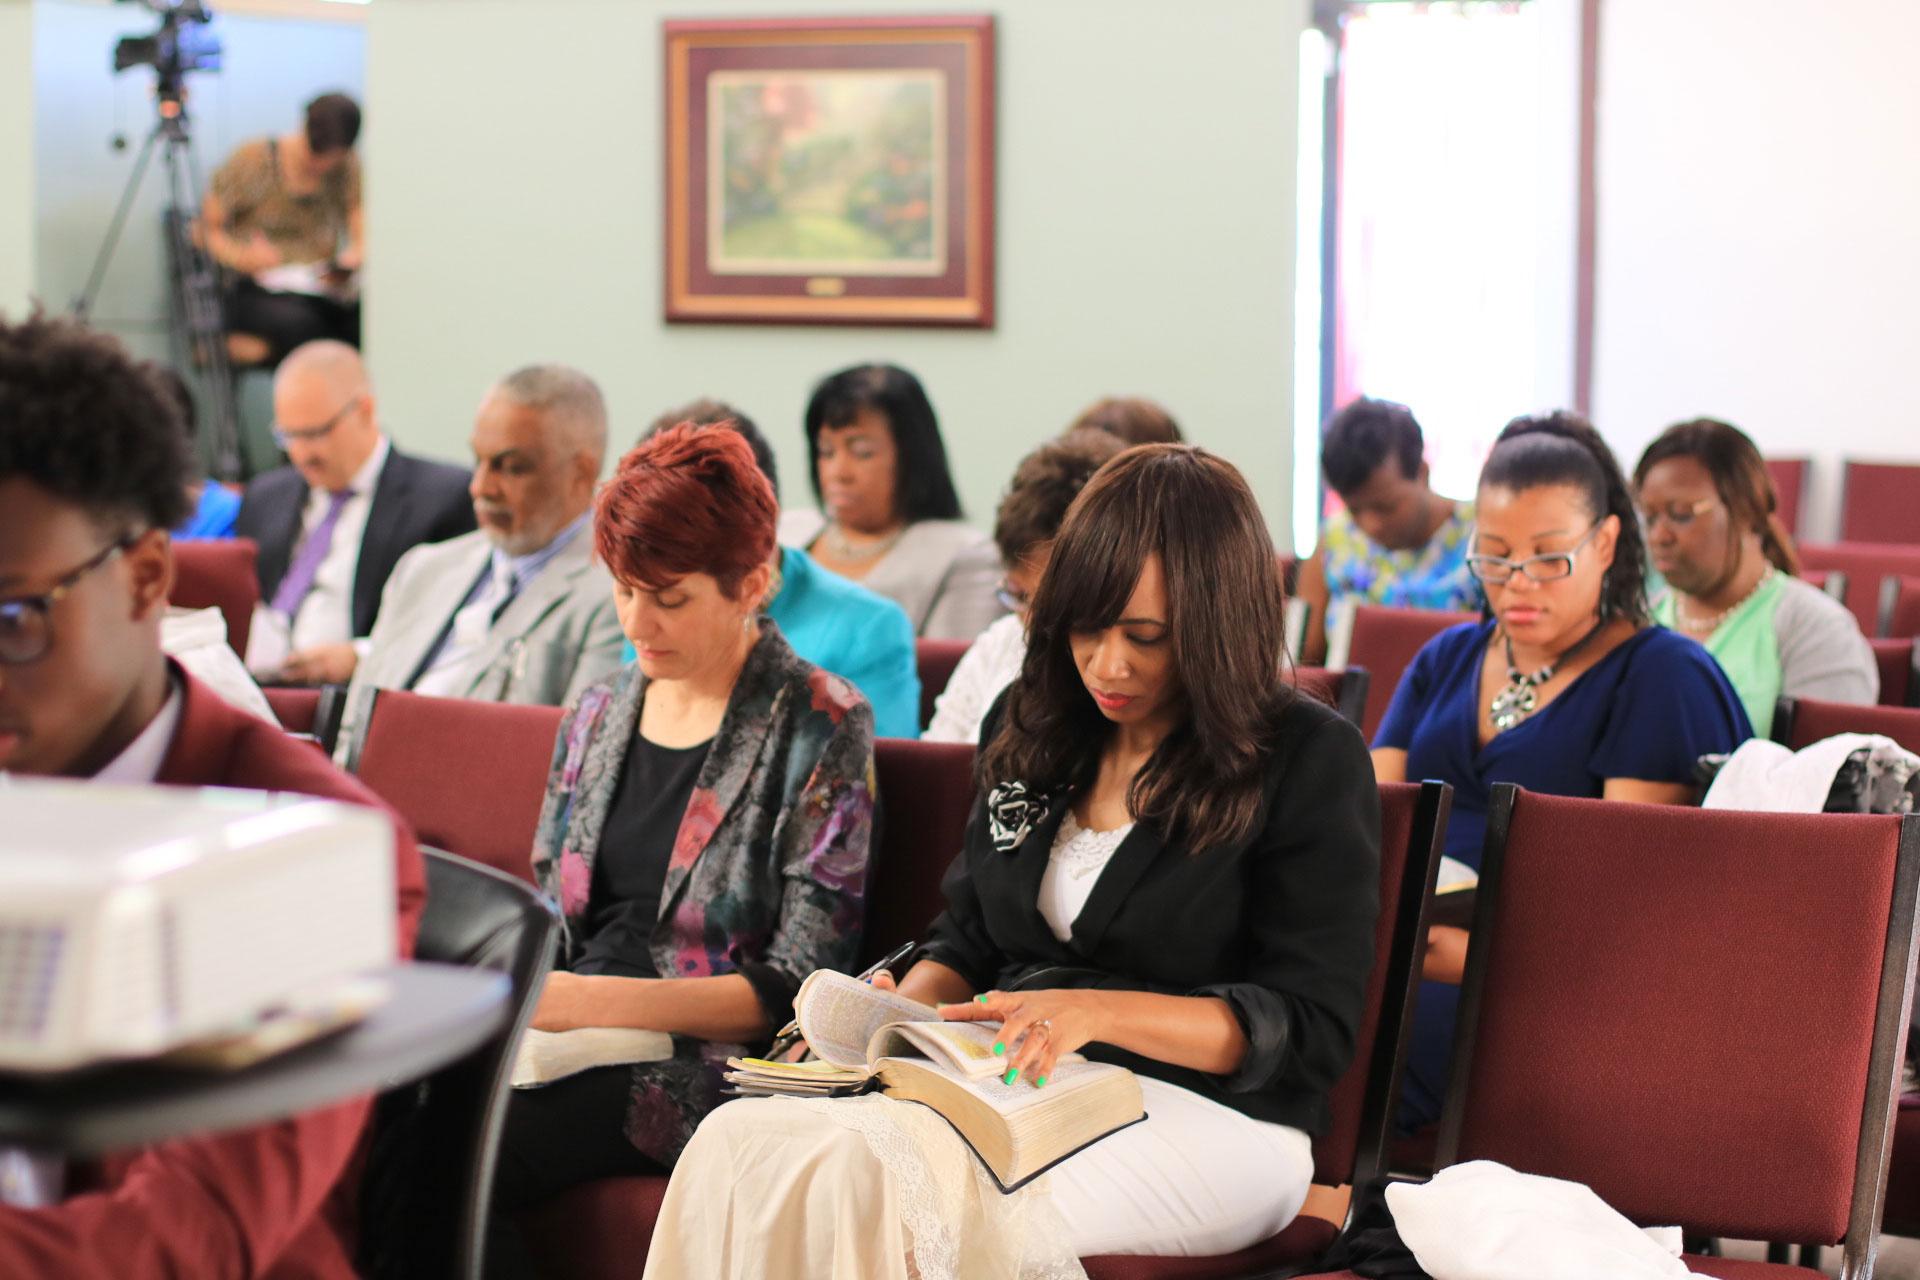 Snapshot of a Bible Study